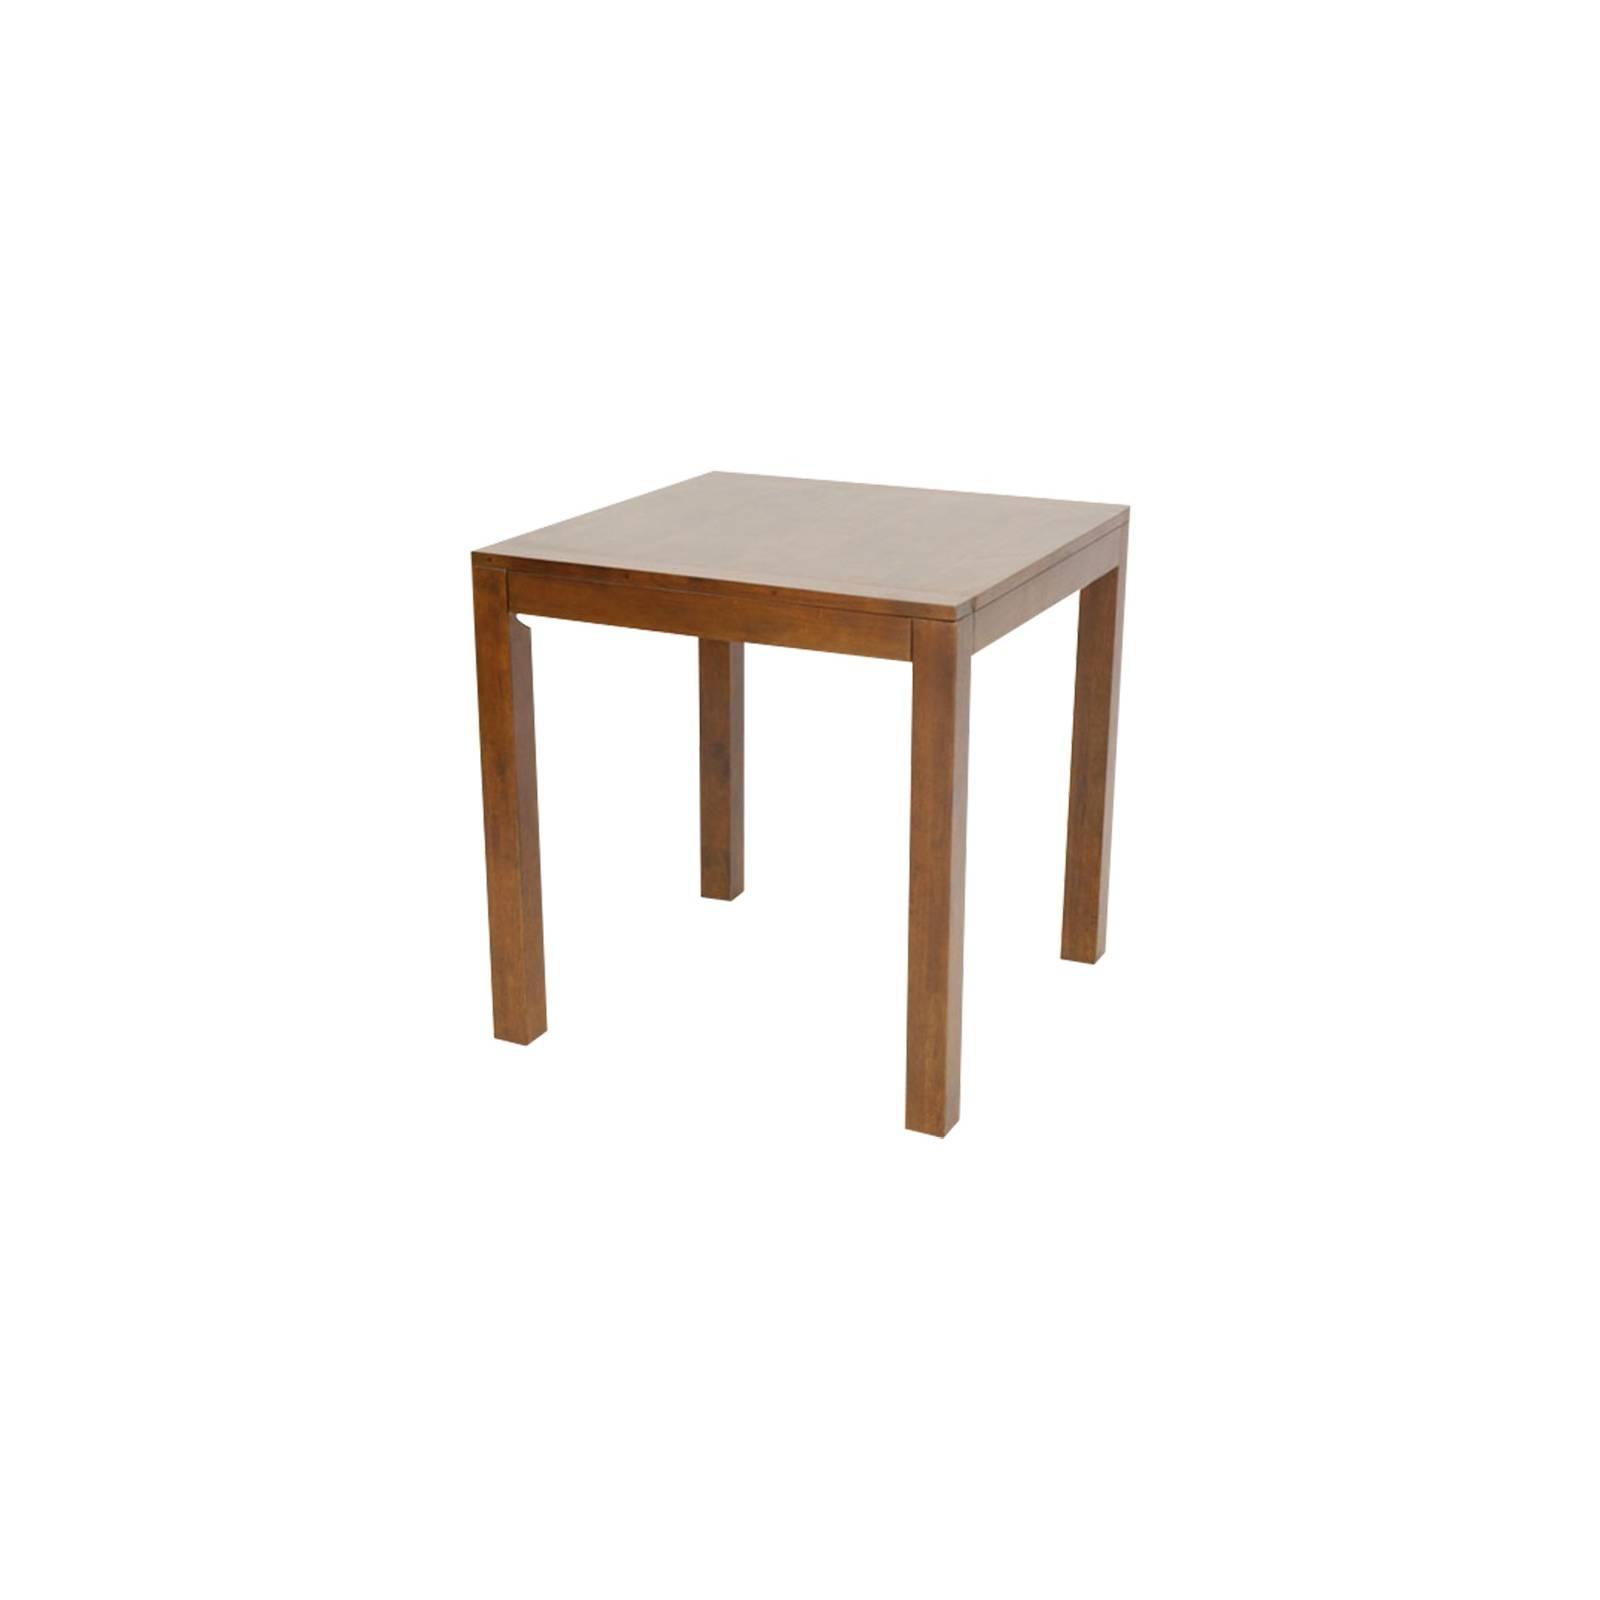 Table de bar en bois exotique Omega